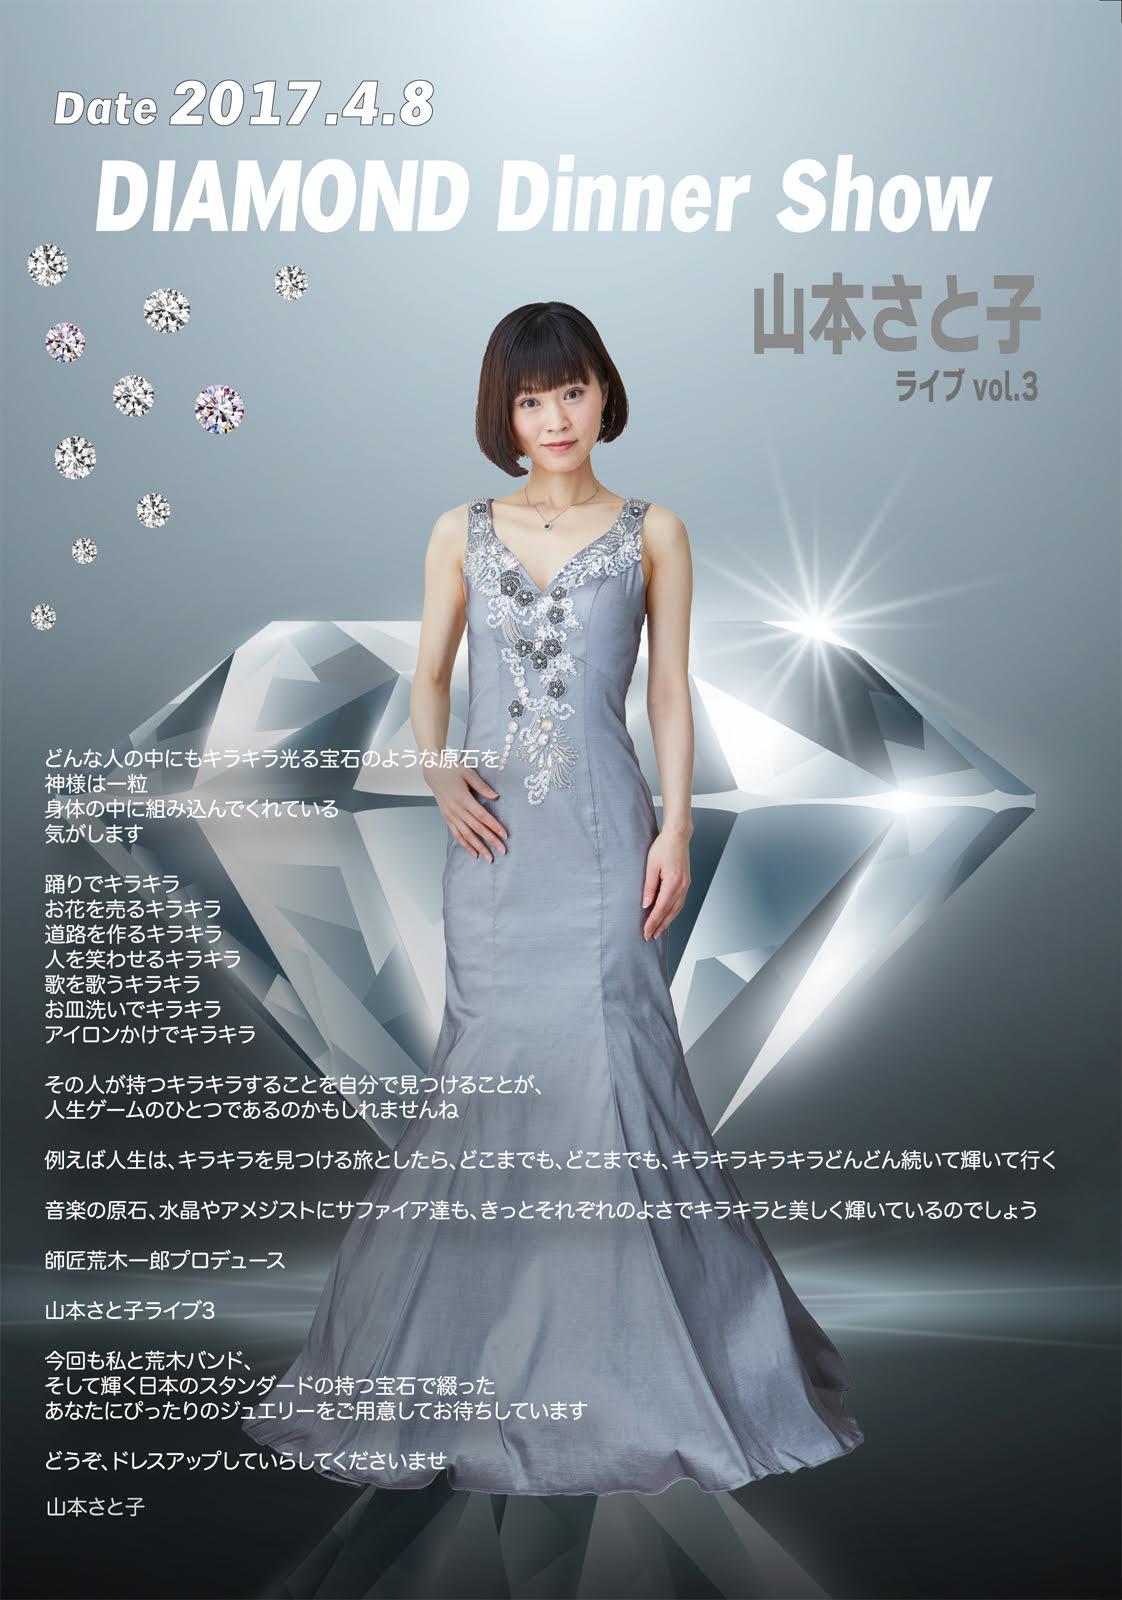 DIAMOND Dinner Show 山本さと子ライブ vol.3